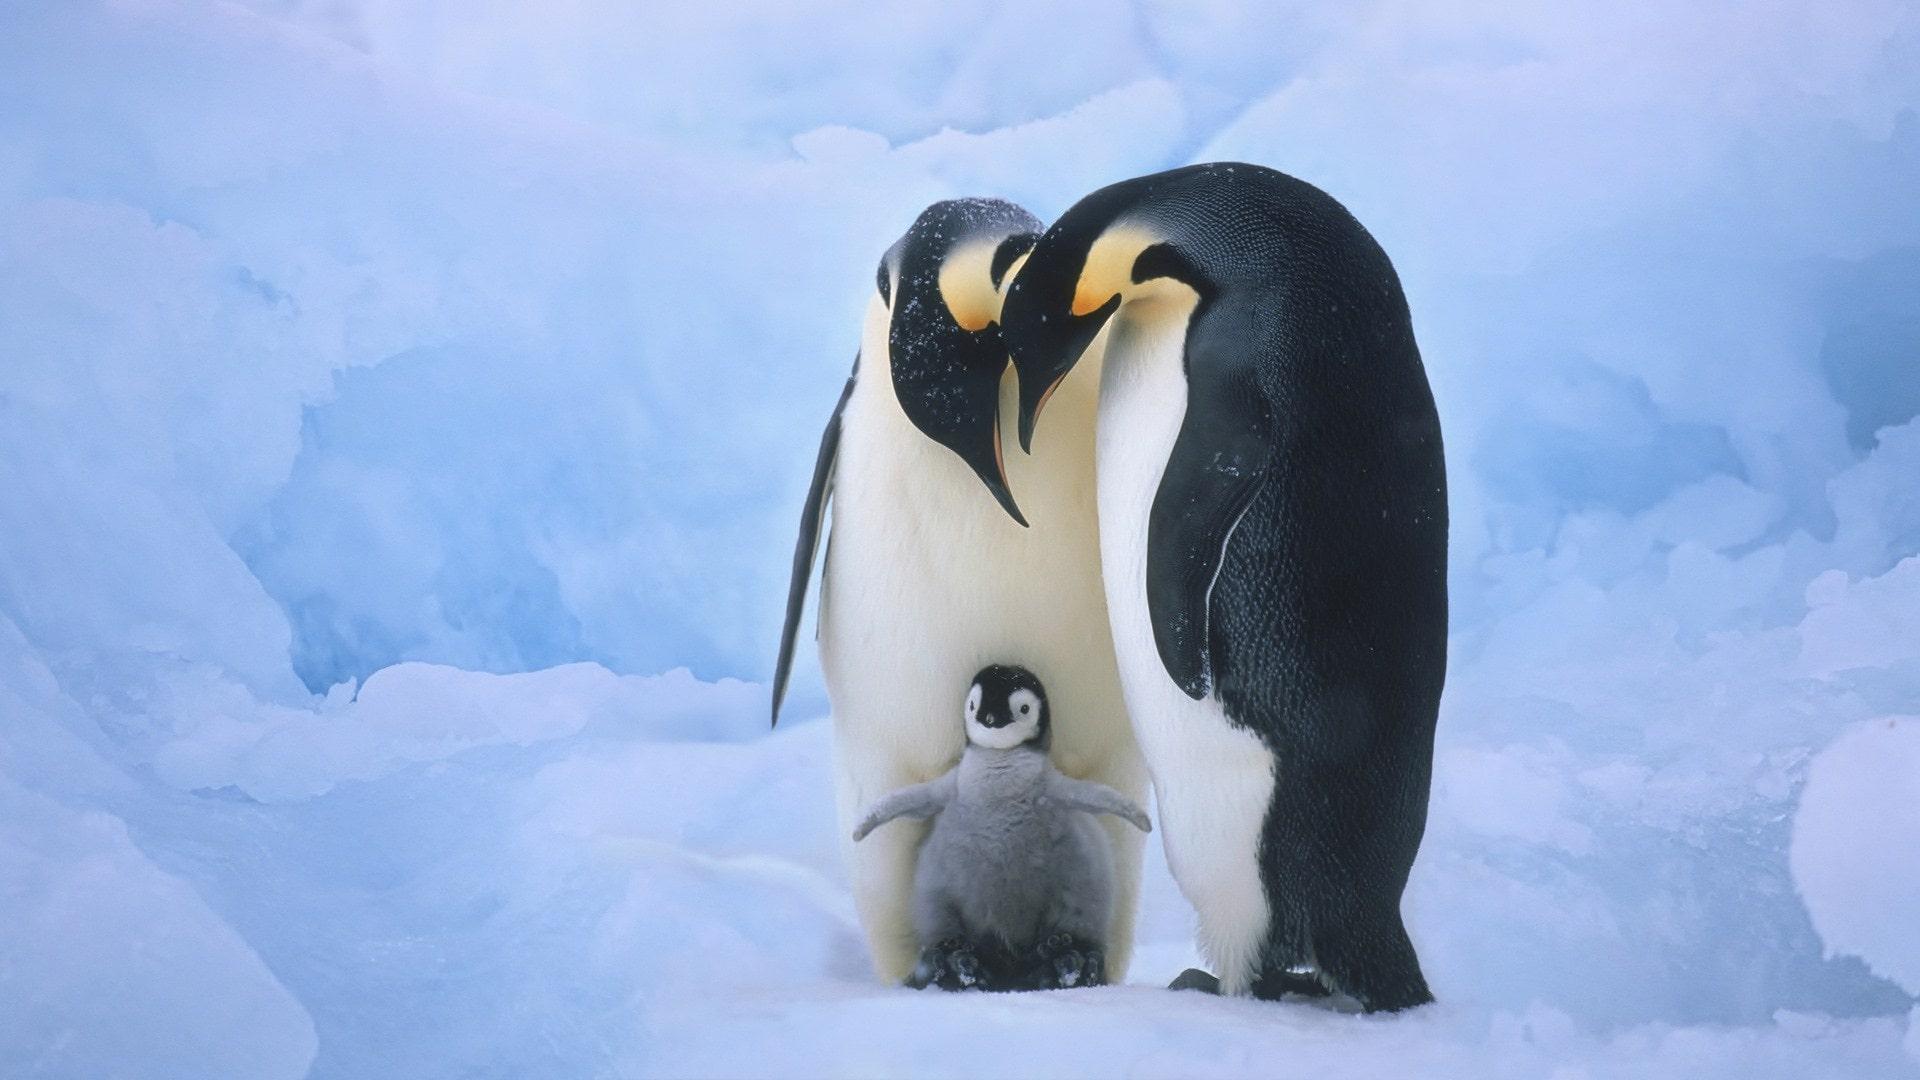 Penguin Full hd wallpapers